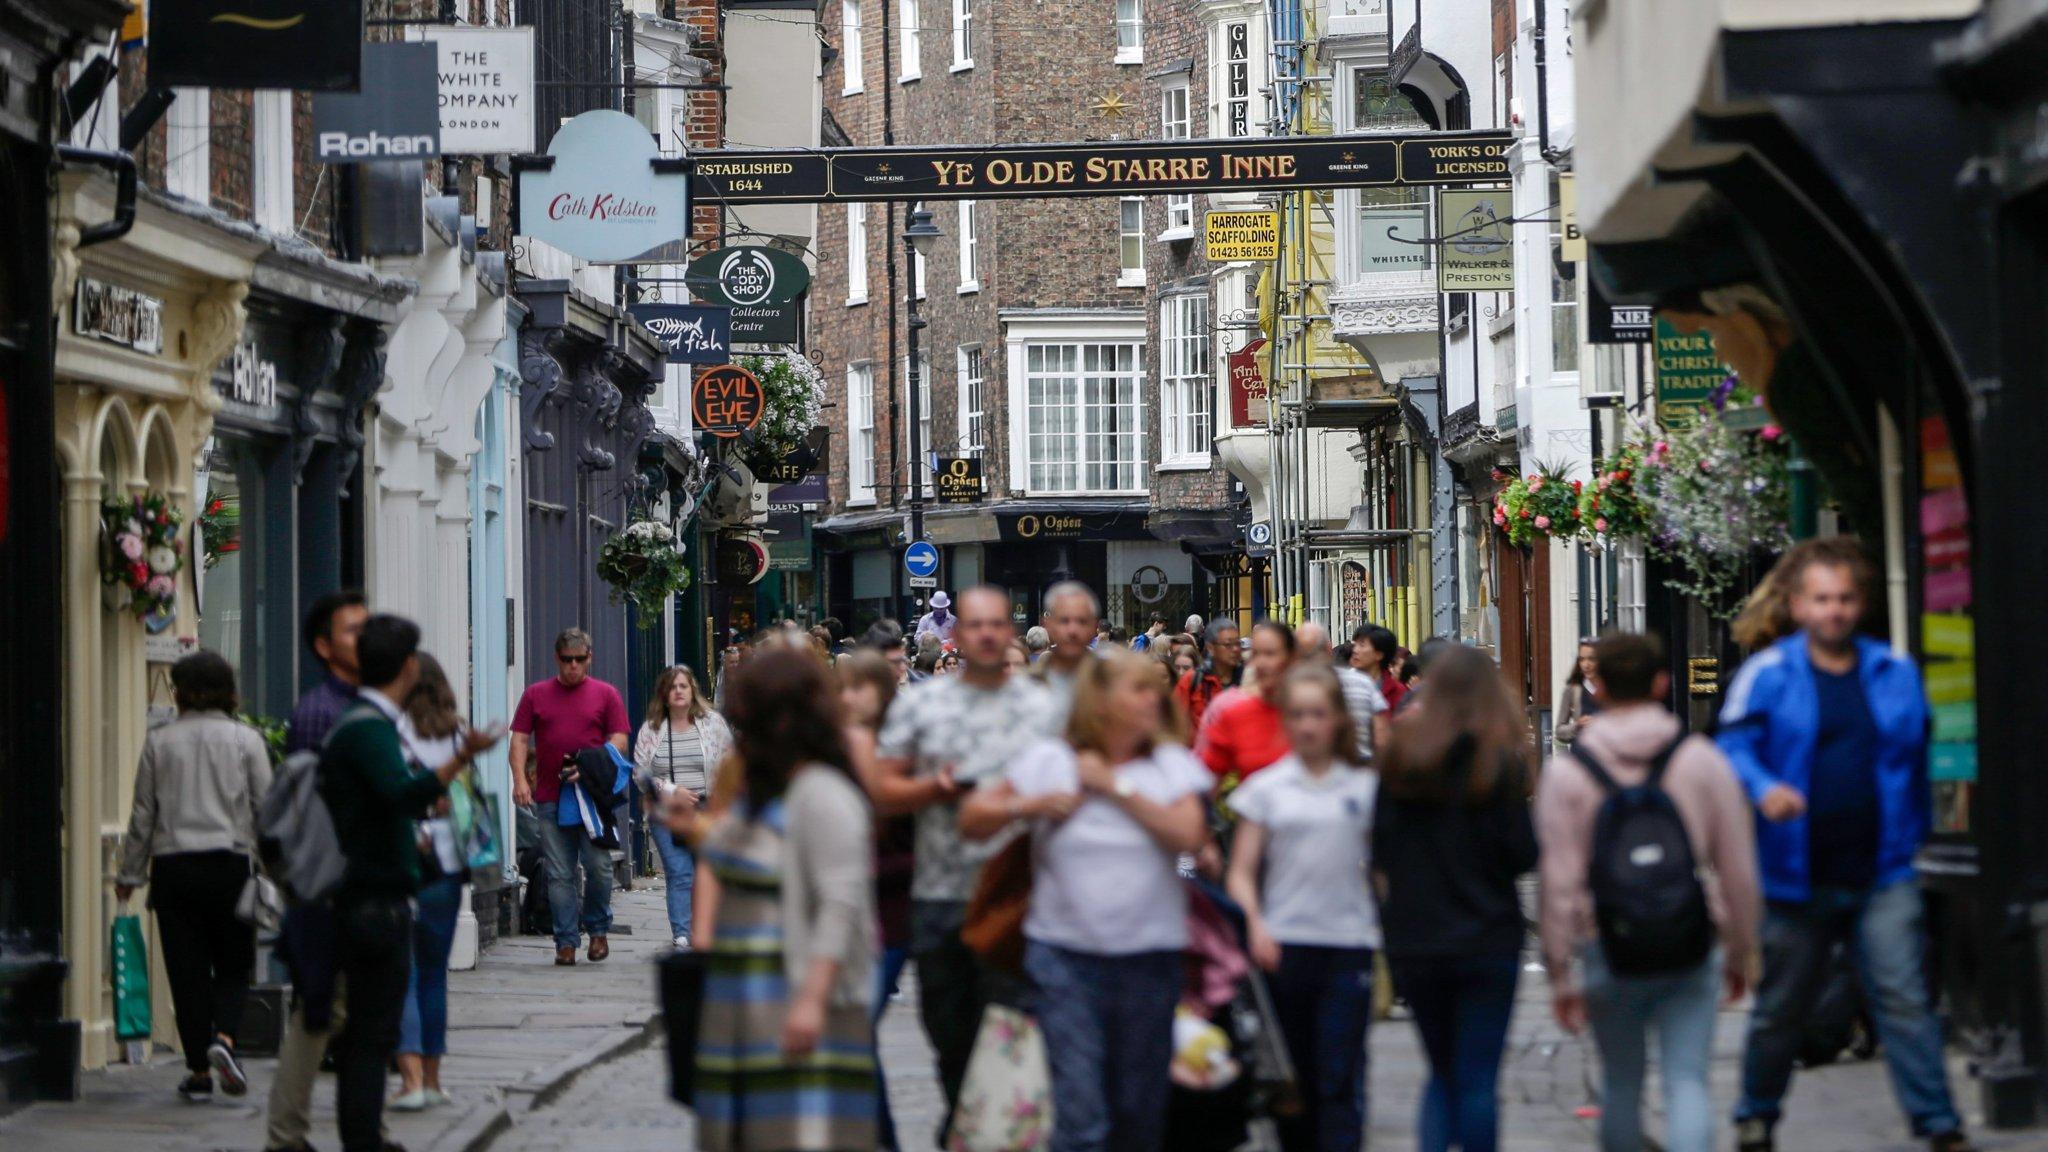 No-deal Brexit would push UK into recession, warns KPMG